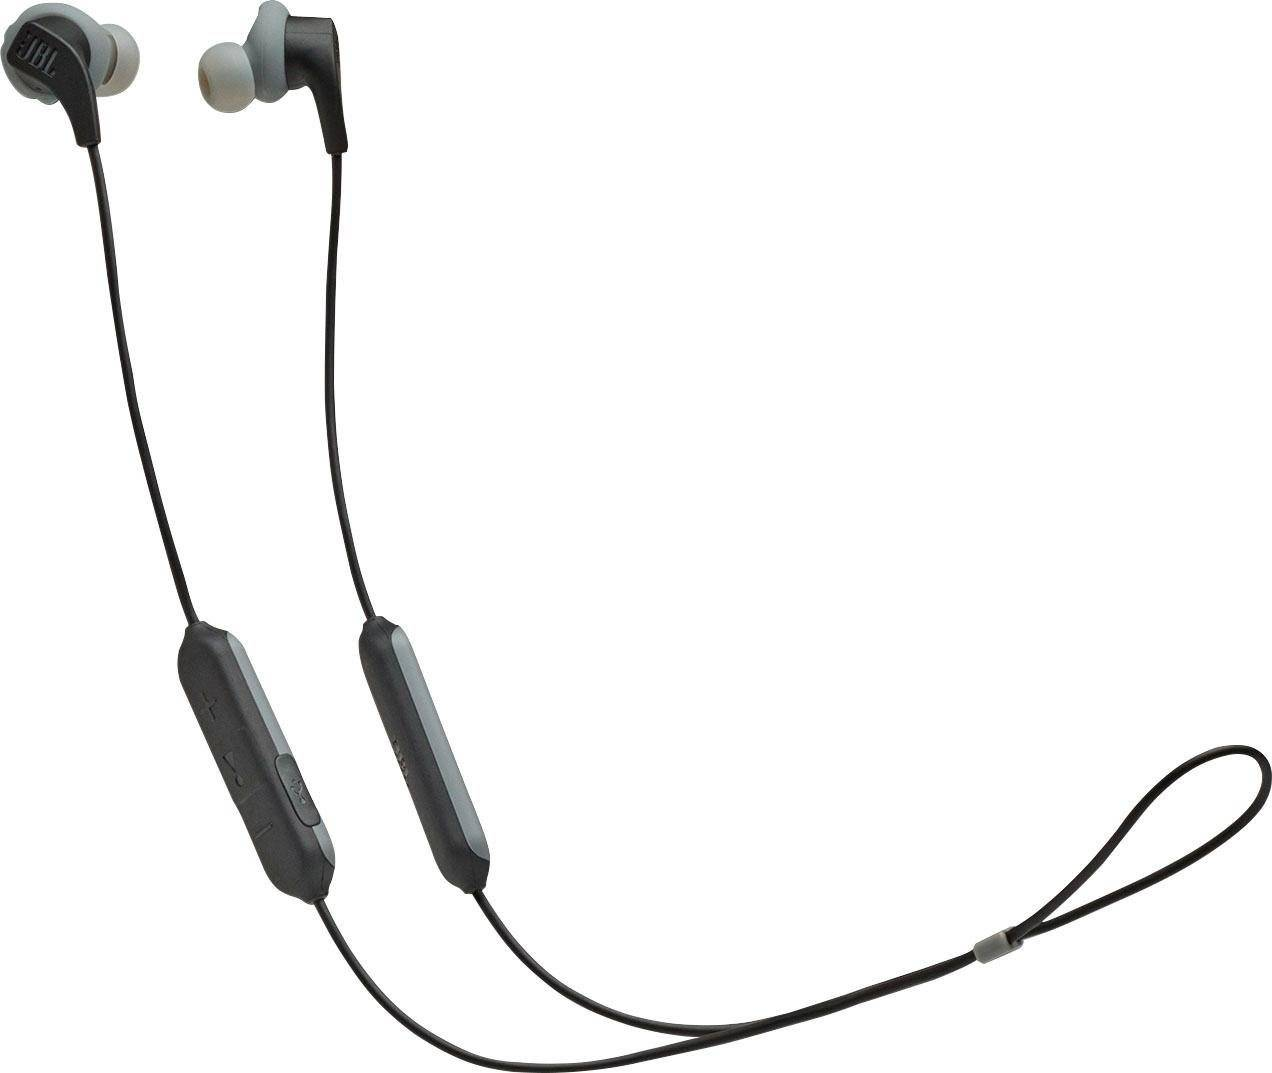 JBL »Endurance Run BT« wireless In-Ear-Kopfhörer (Bluetooth), schwarz